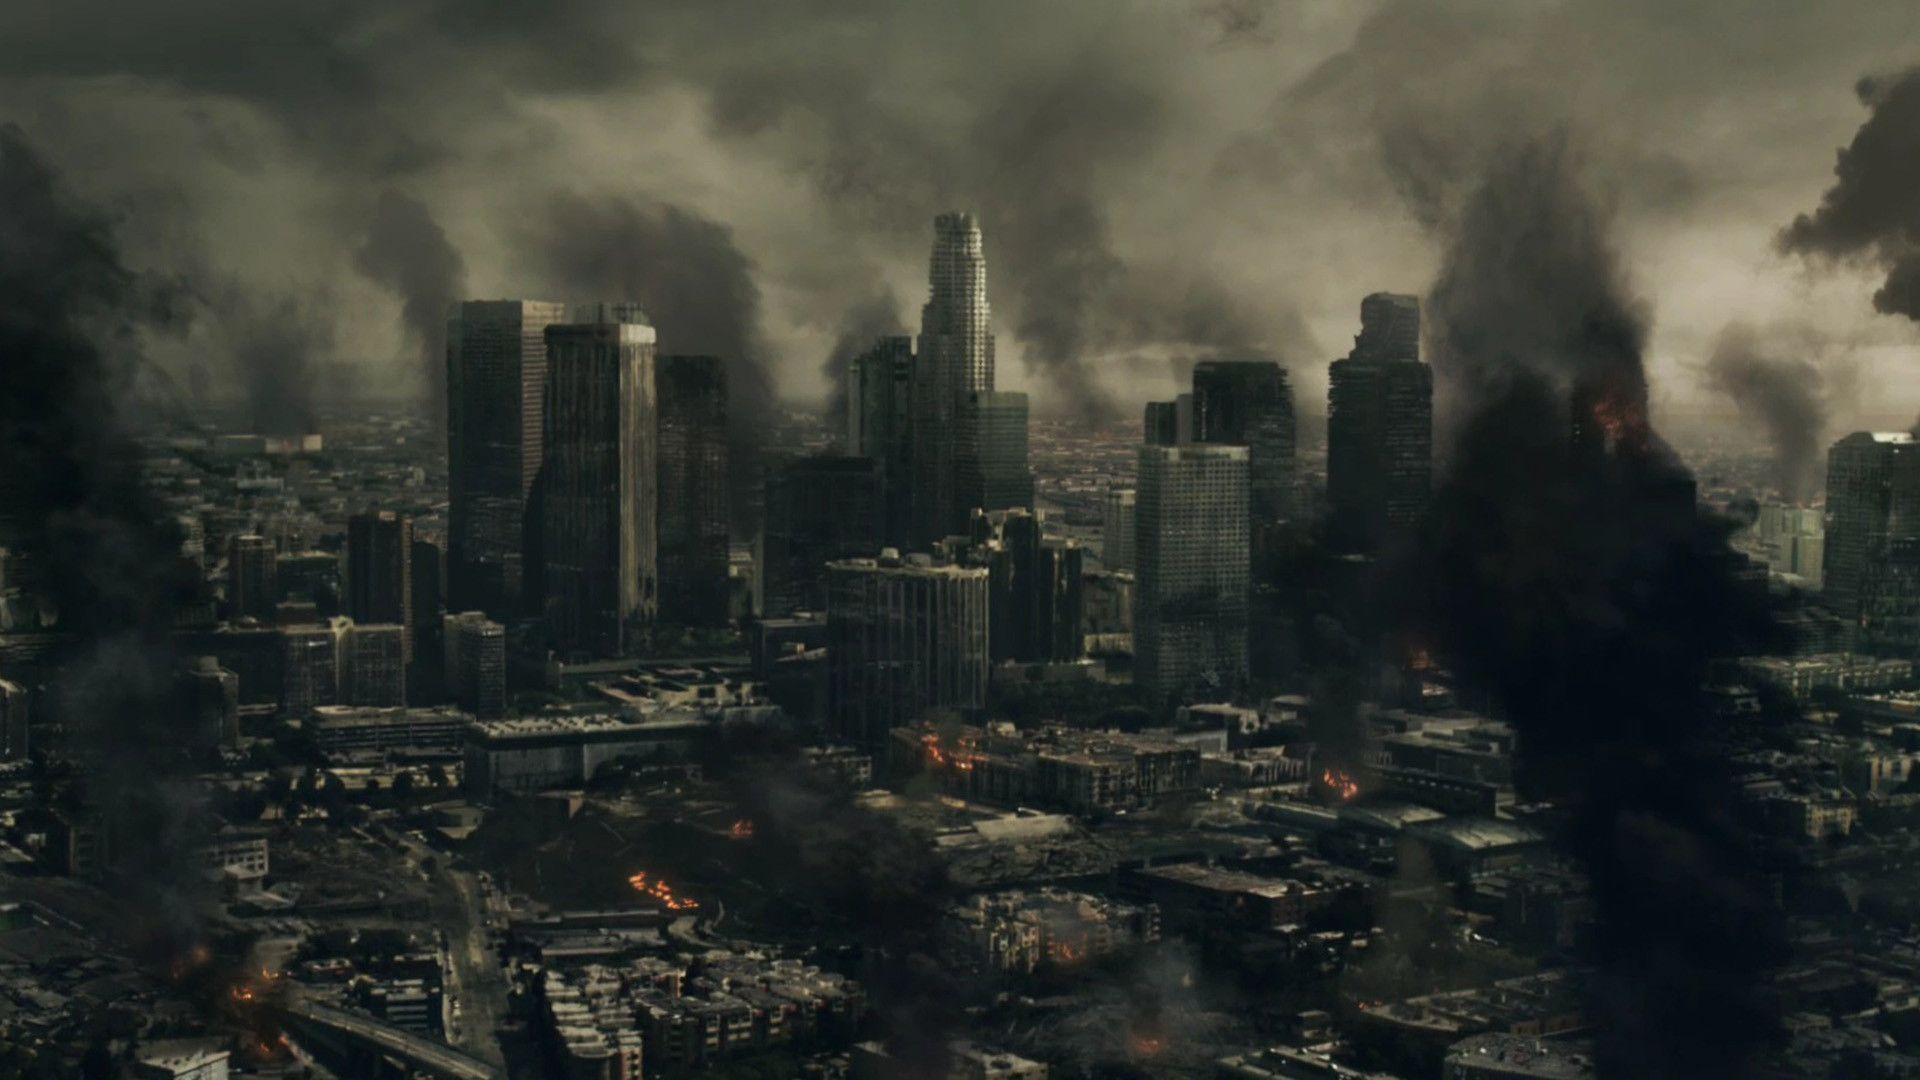 evil landscape background - photo #25